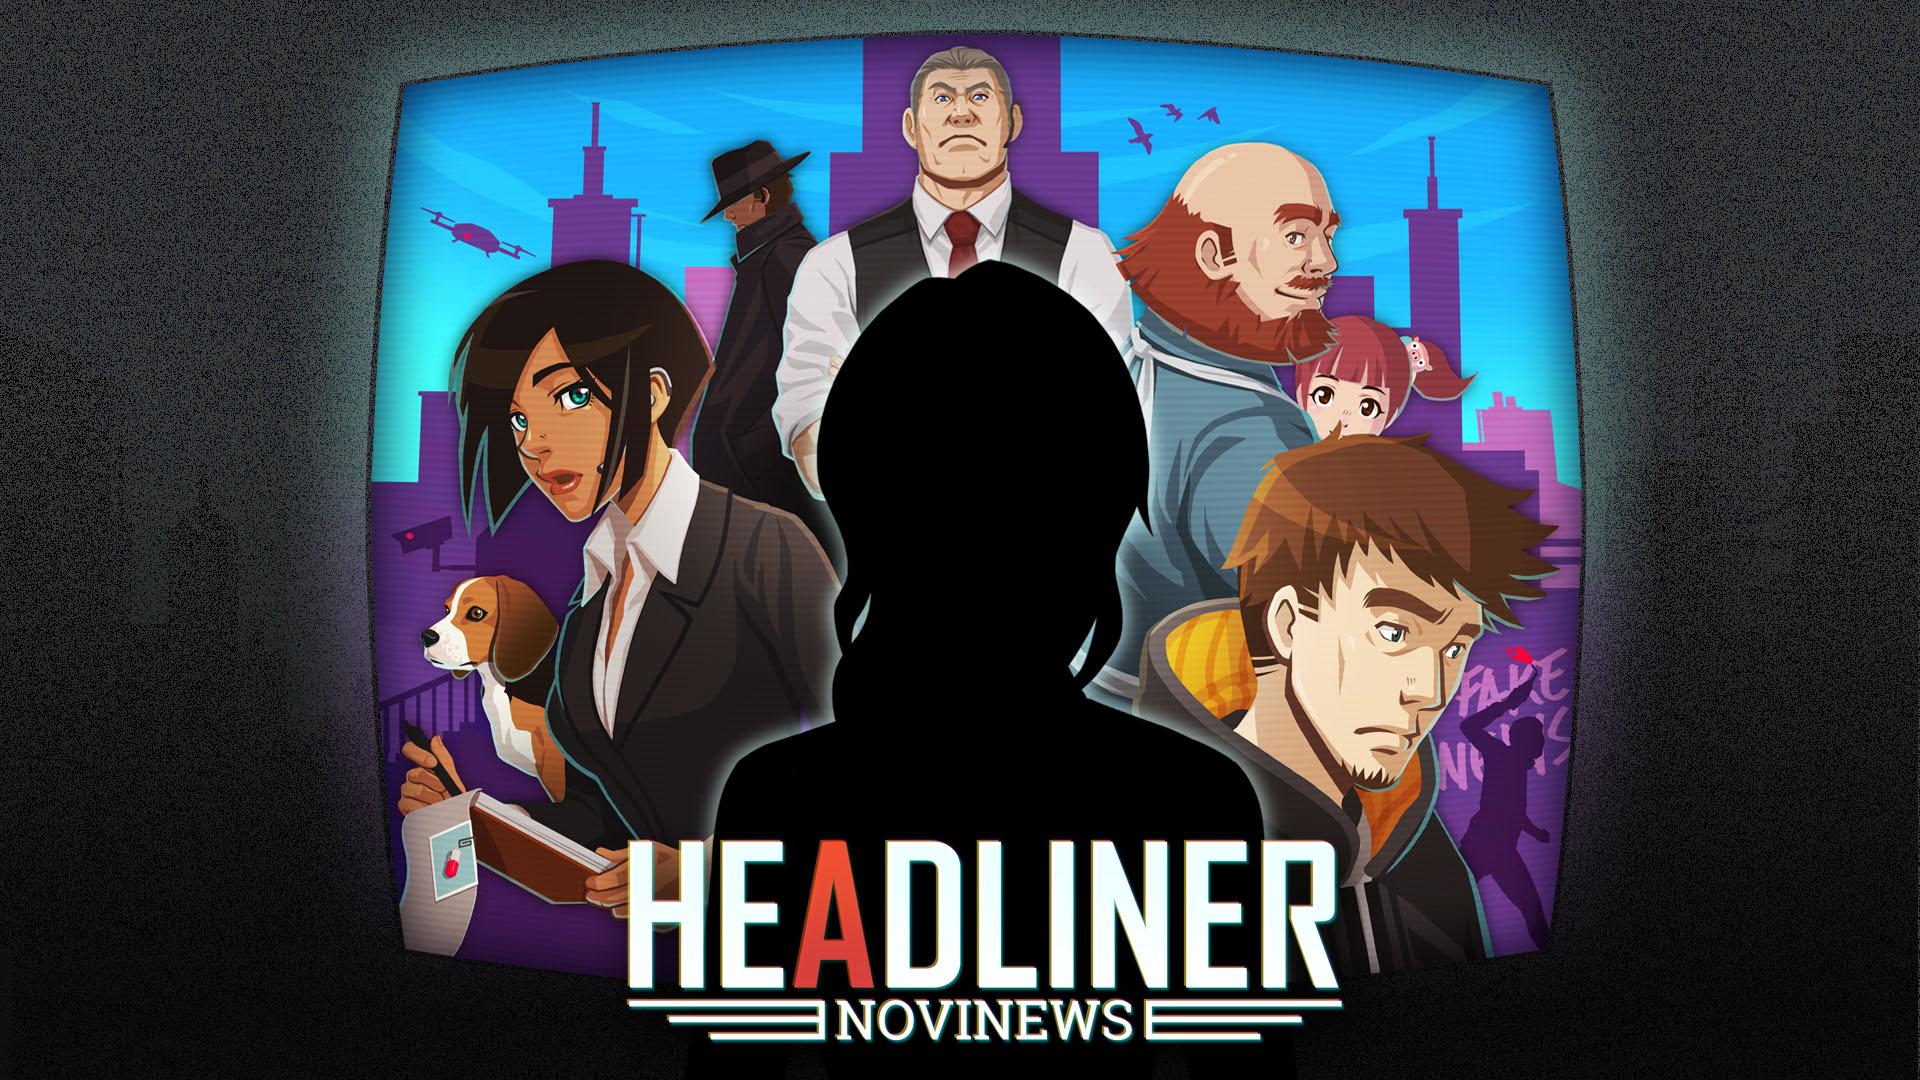 Headliner: NoviNews review